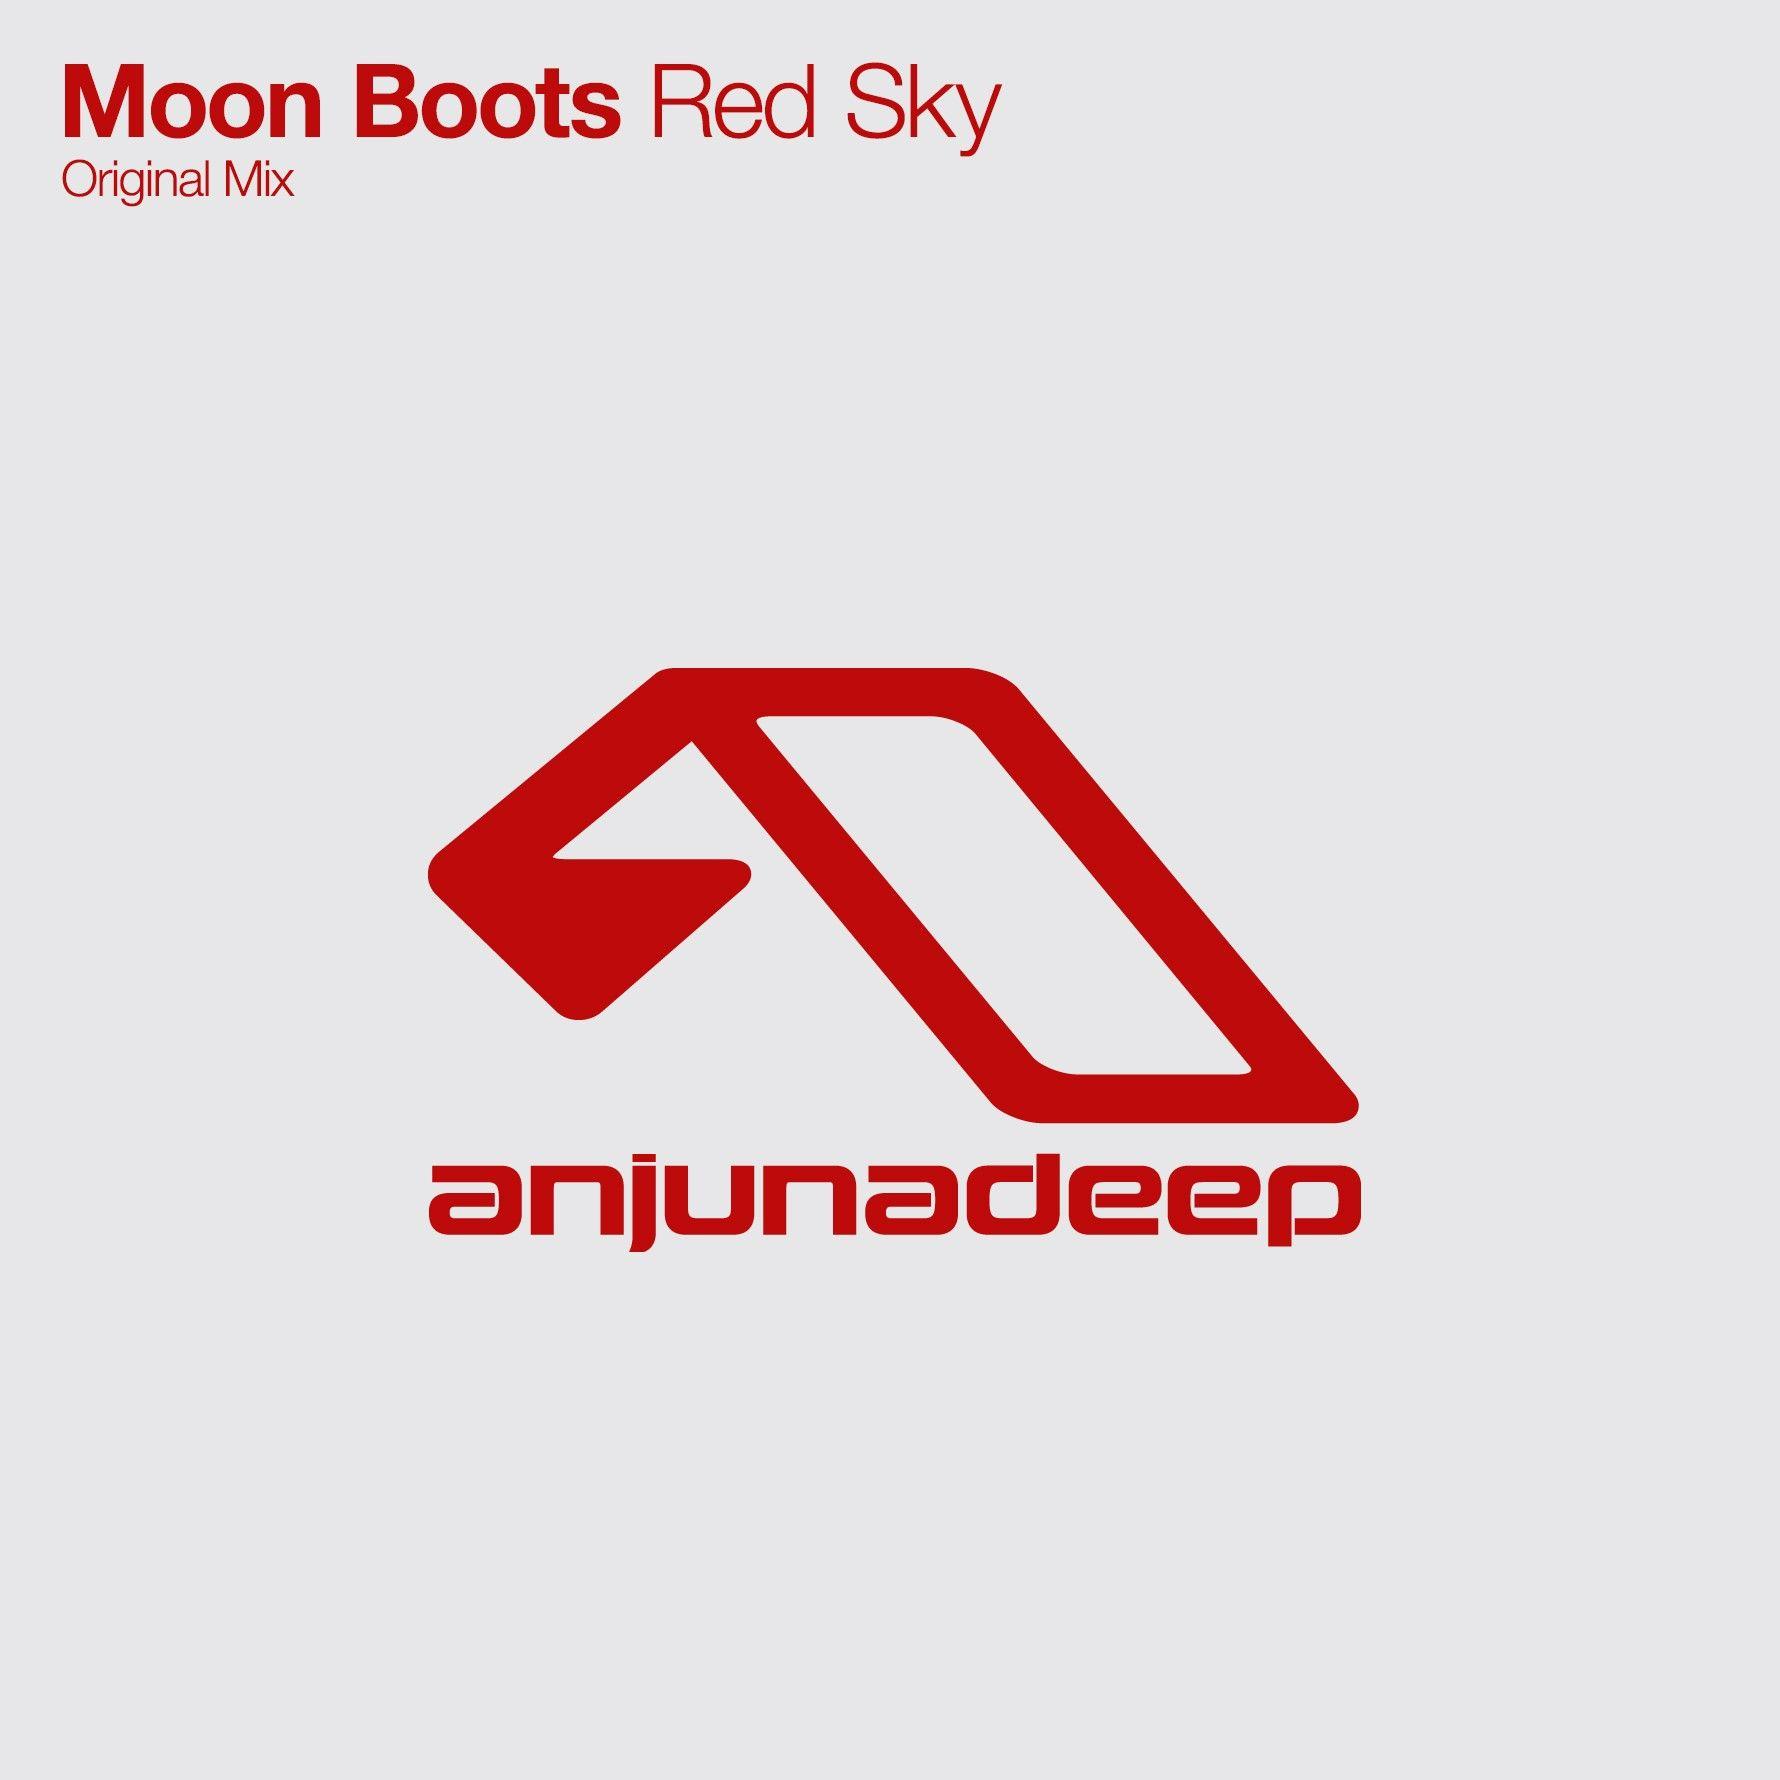 moonboots.jpg